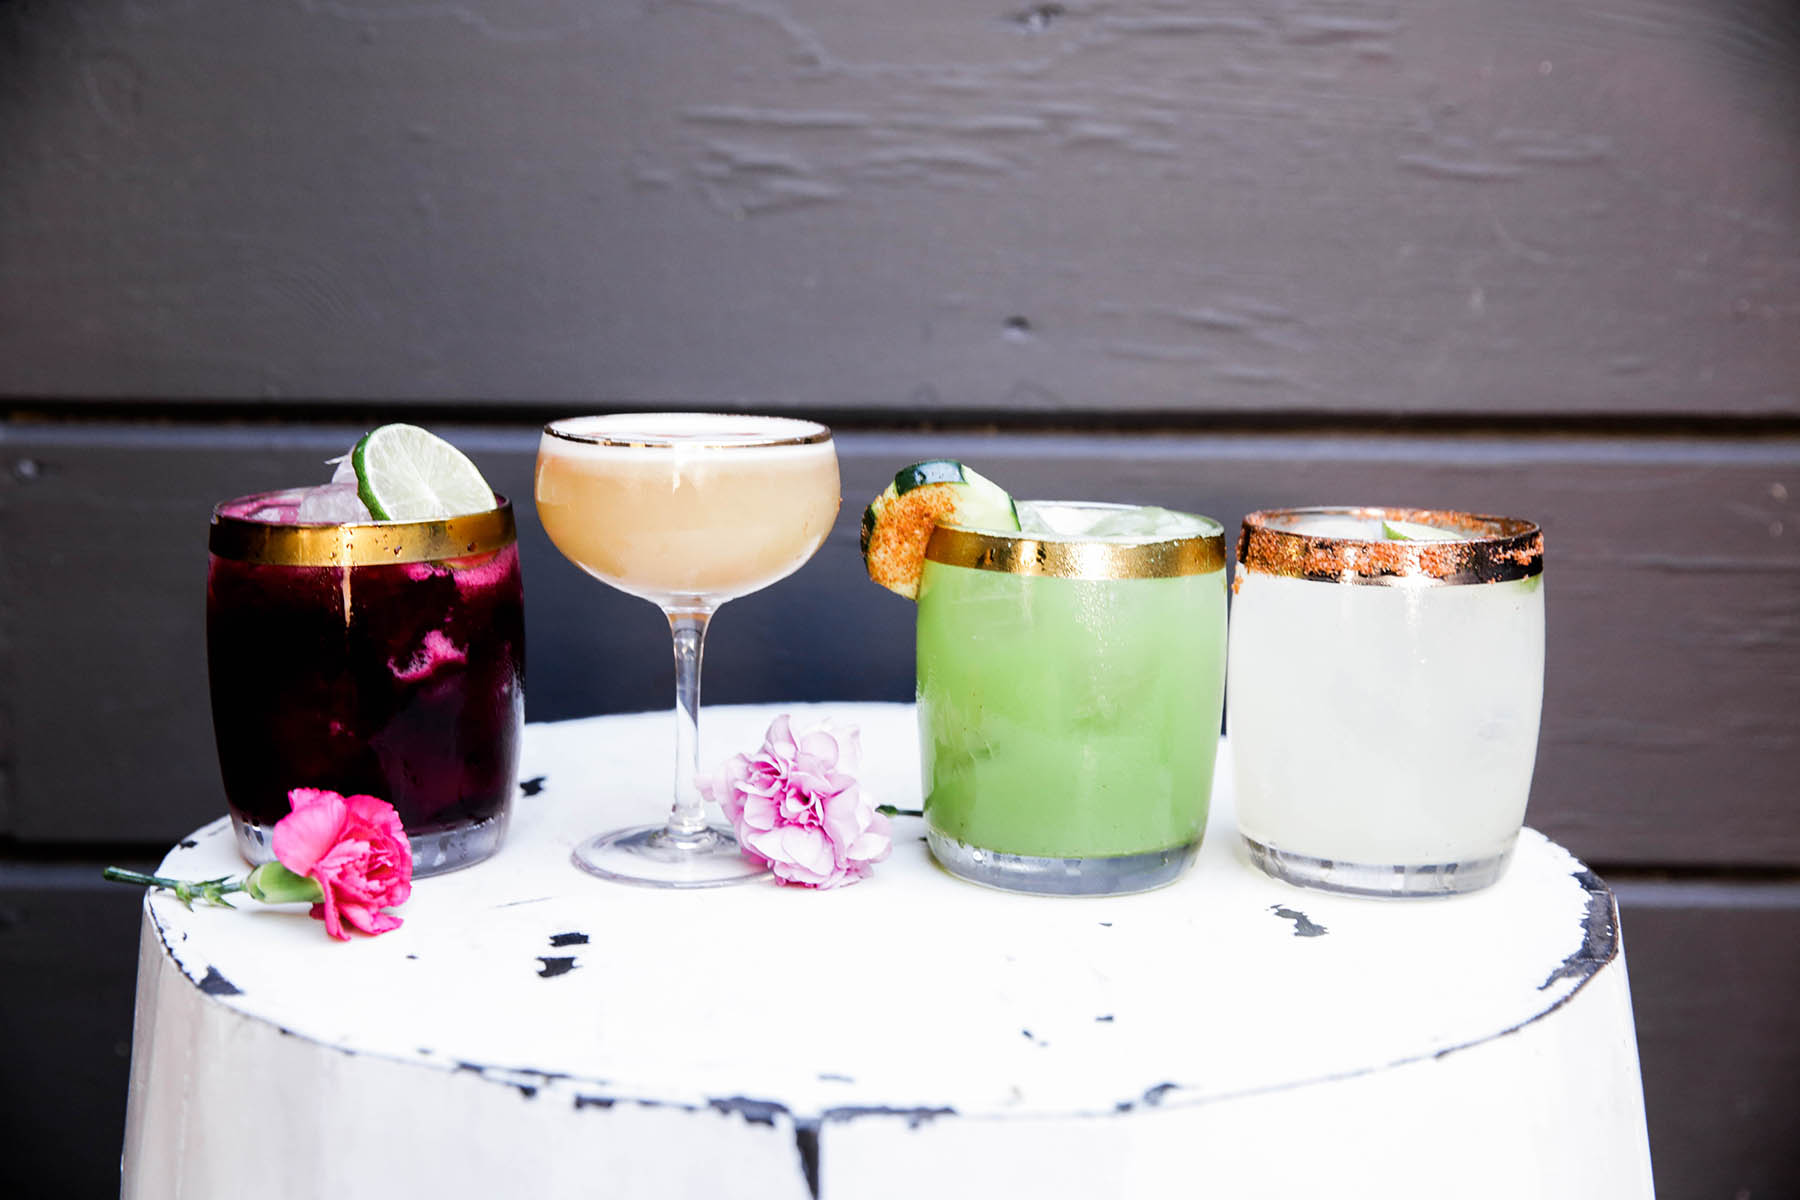 pretty cocktails at El Barrio in Guerneville, Sonoma County, California